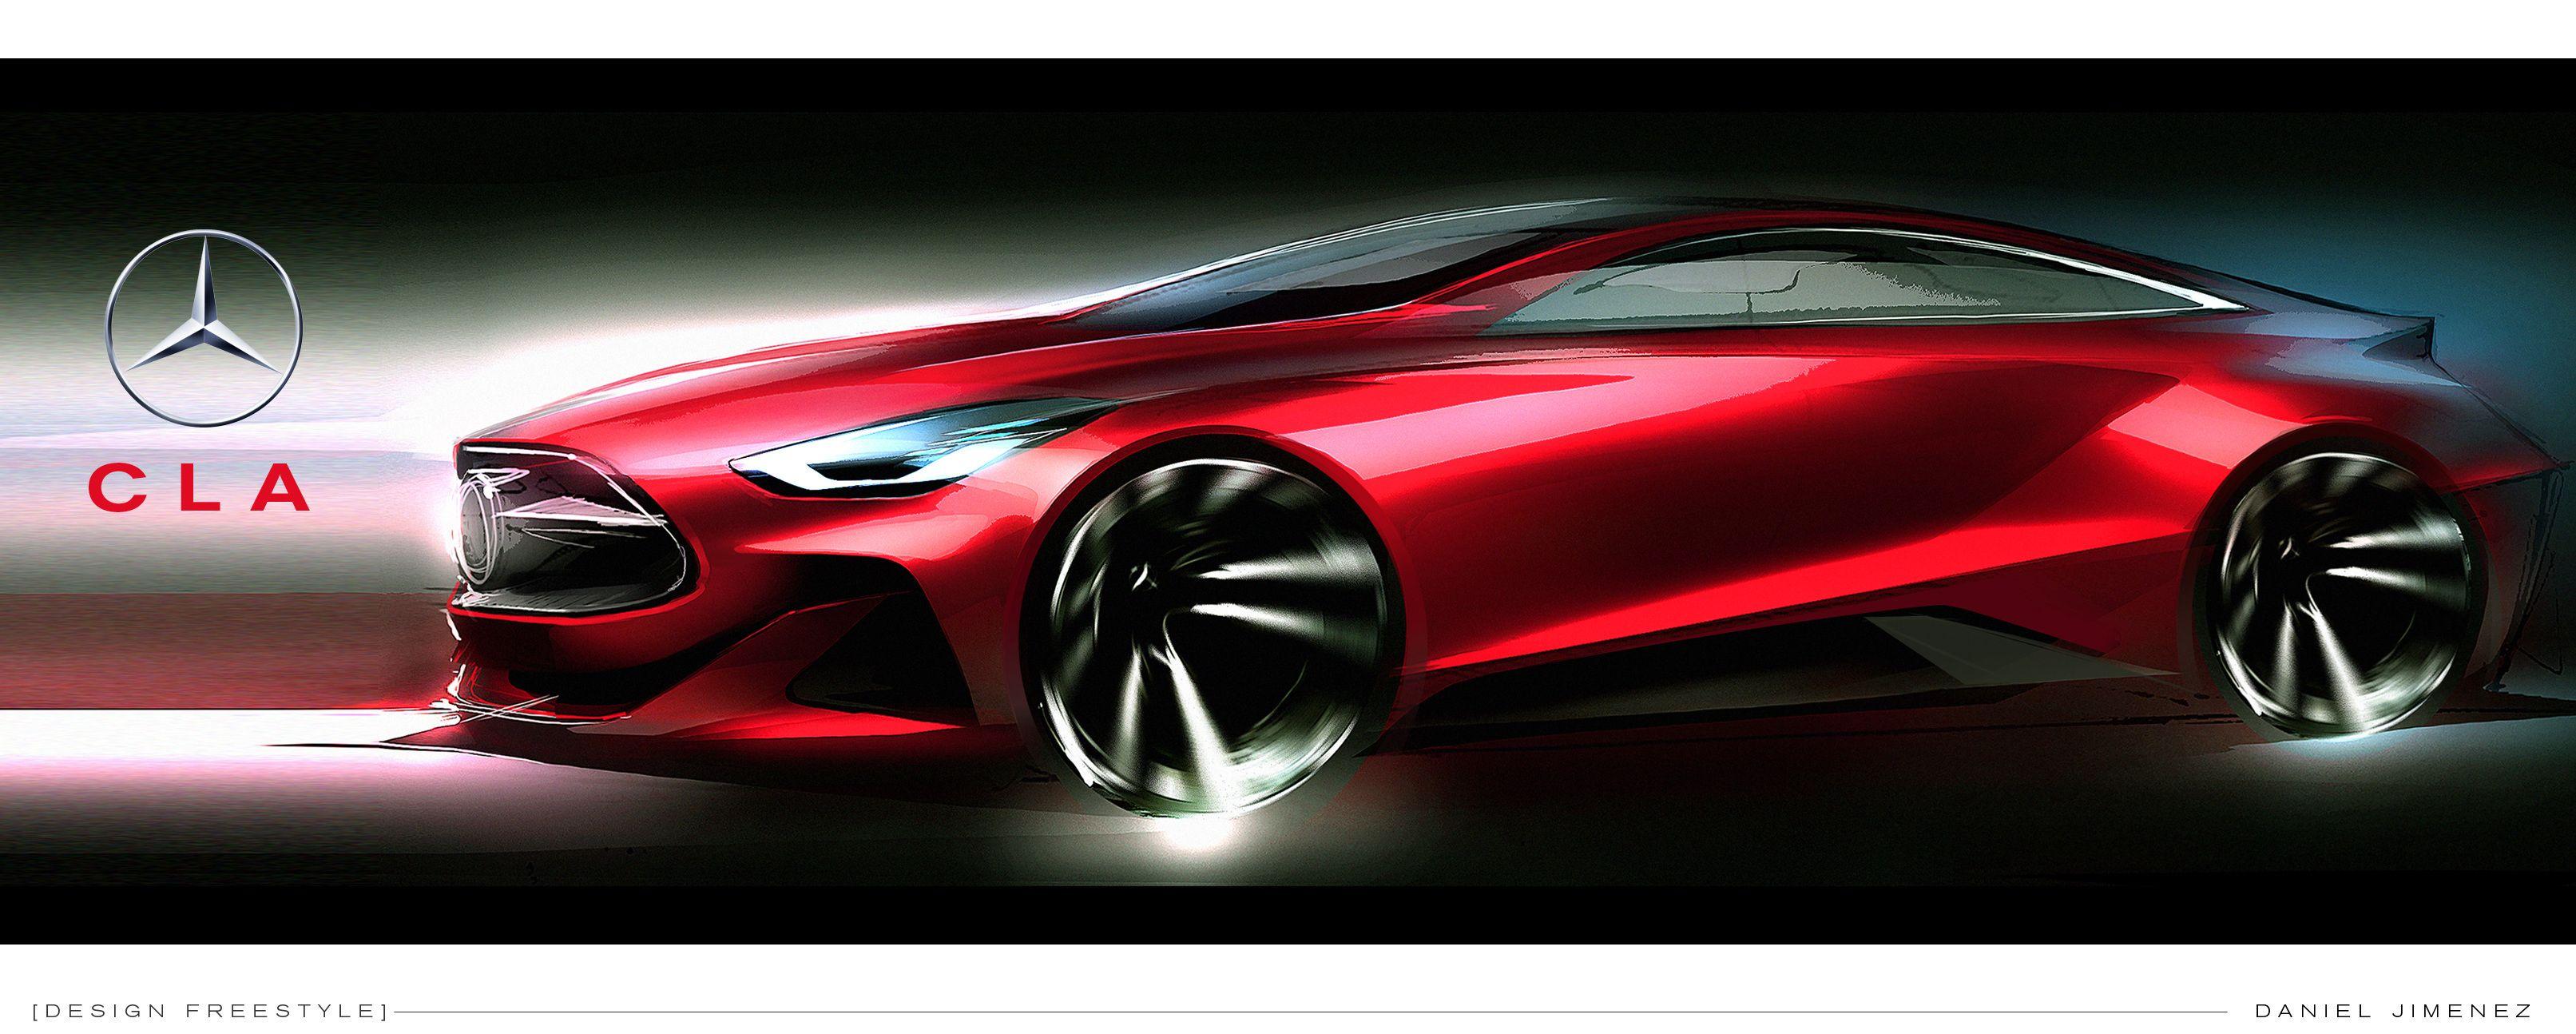 David jimenez transportation car design sketch design et sketch design - Croquis voiture ...